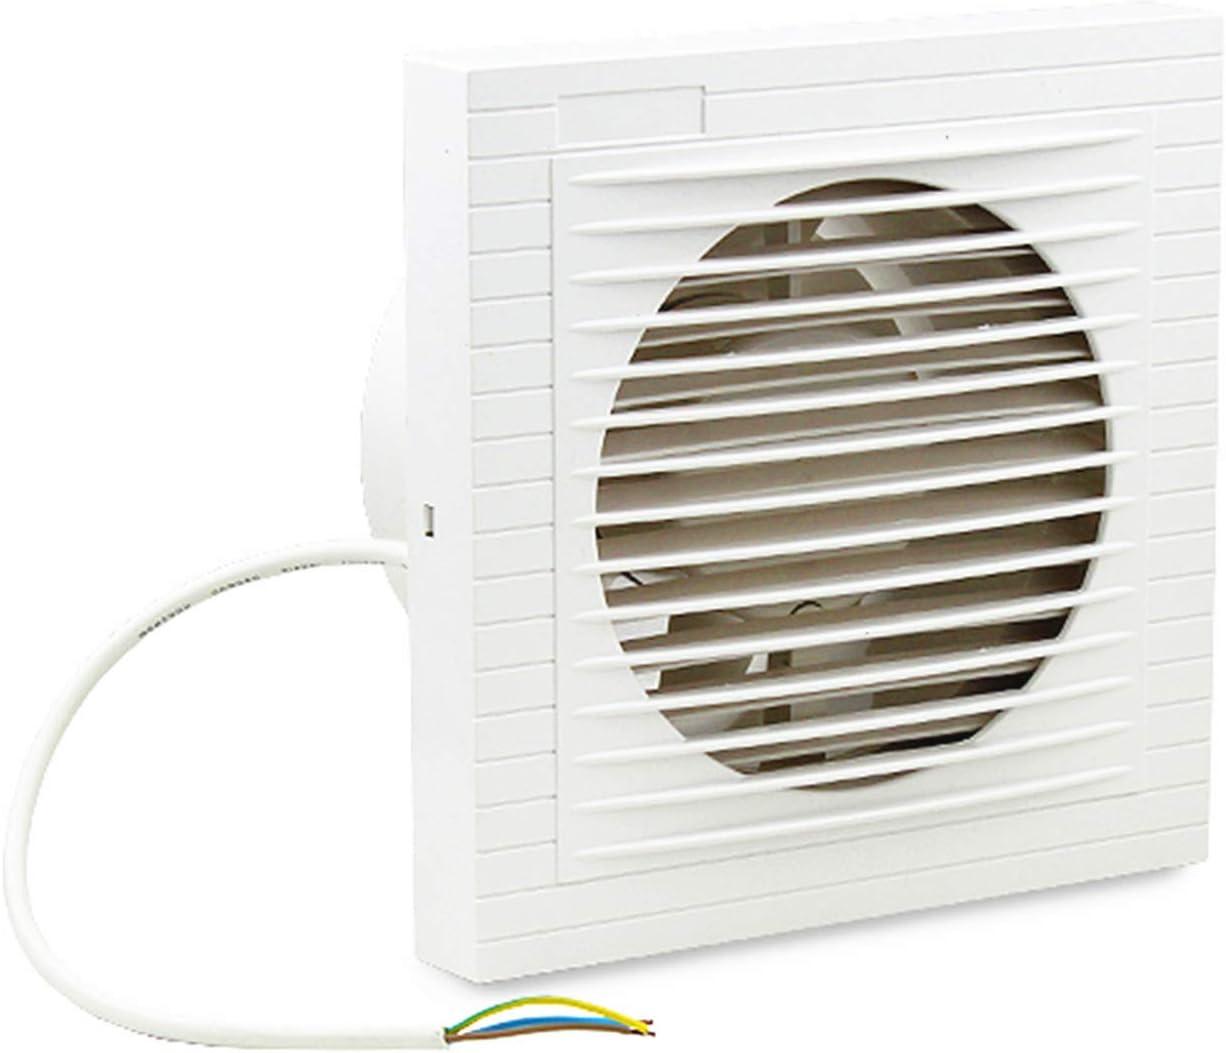 Hengda L/üfter 150mm Wandventilator Rohrventilator Abluftventilator Bad Ventilatorf/ür Bad und K/üche